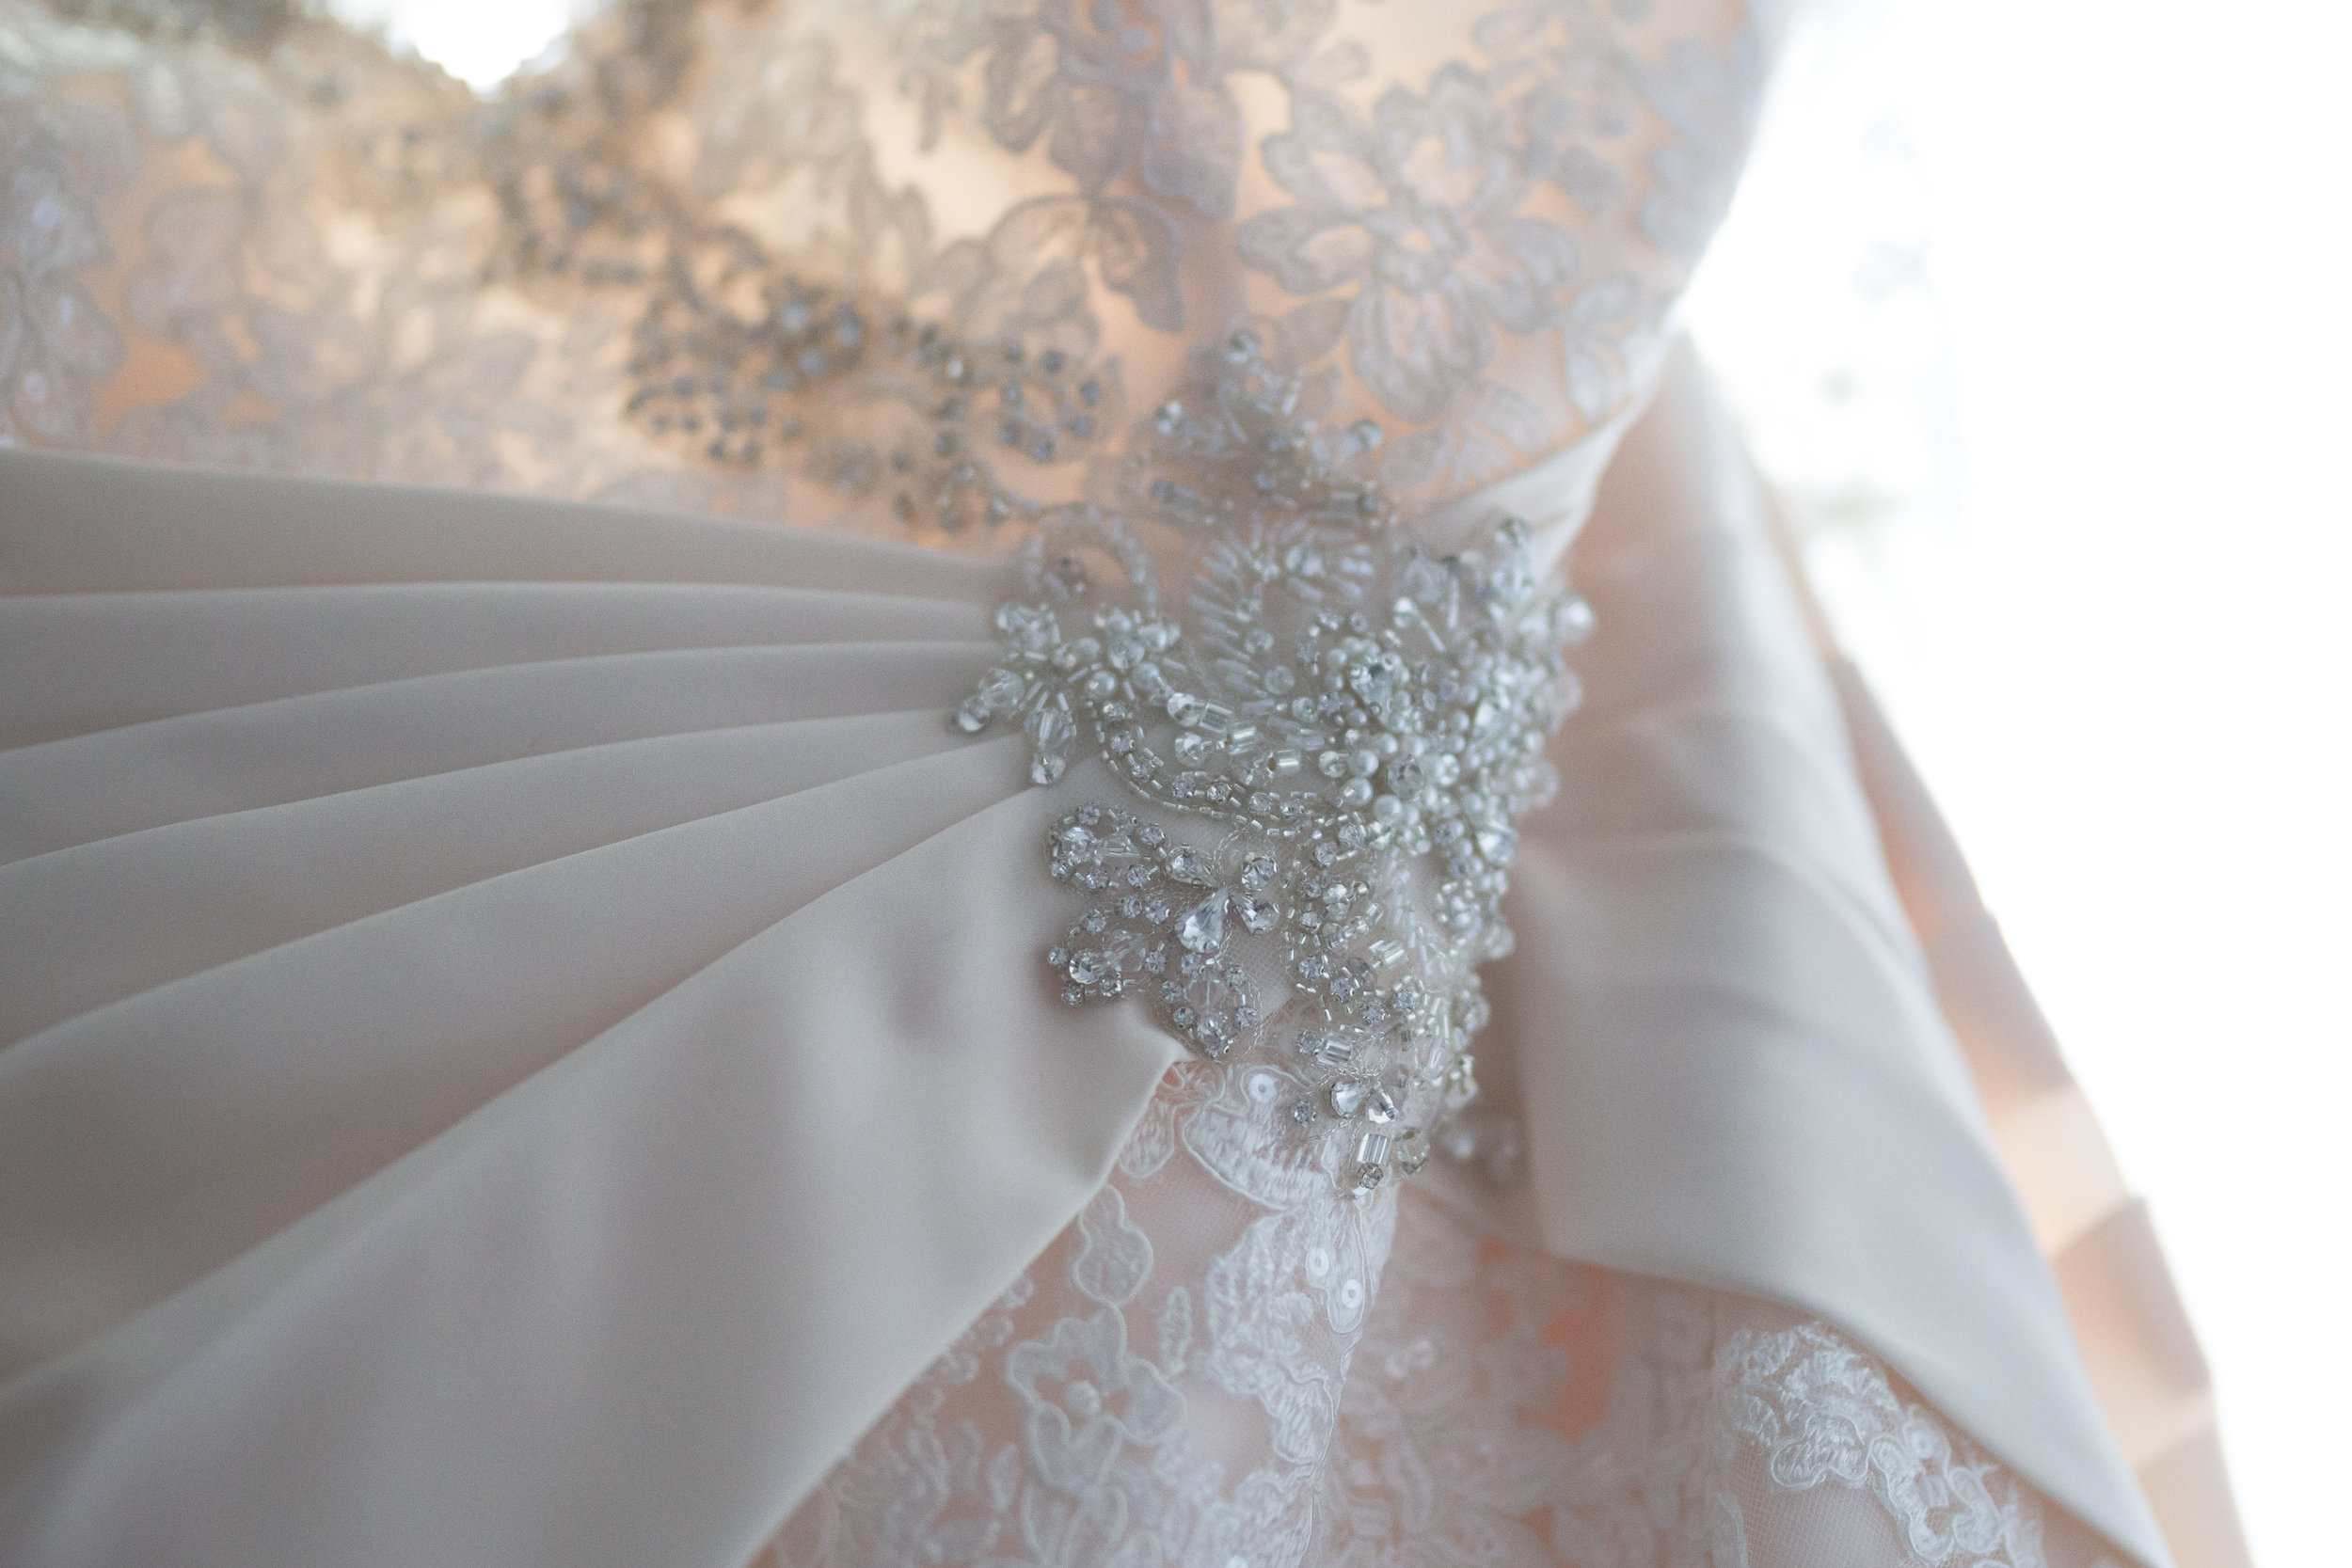 Antoinette & Stephen - Bridal Preparations | Brian McEwan Photography | Wedding Photographer Northern Ireland 9.jpg